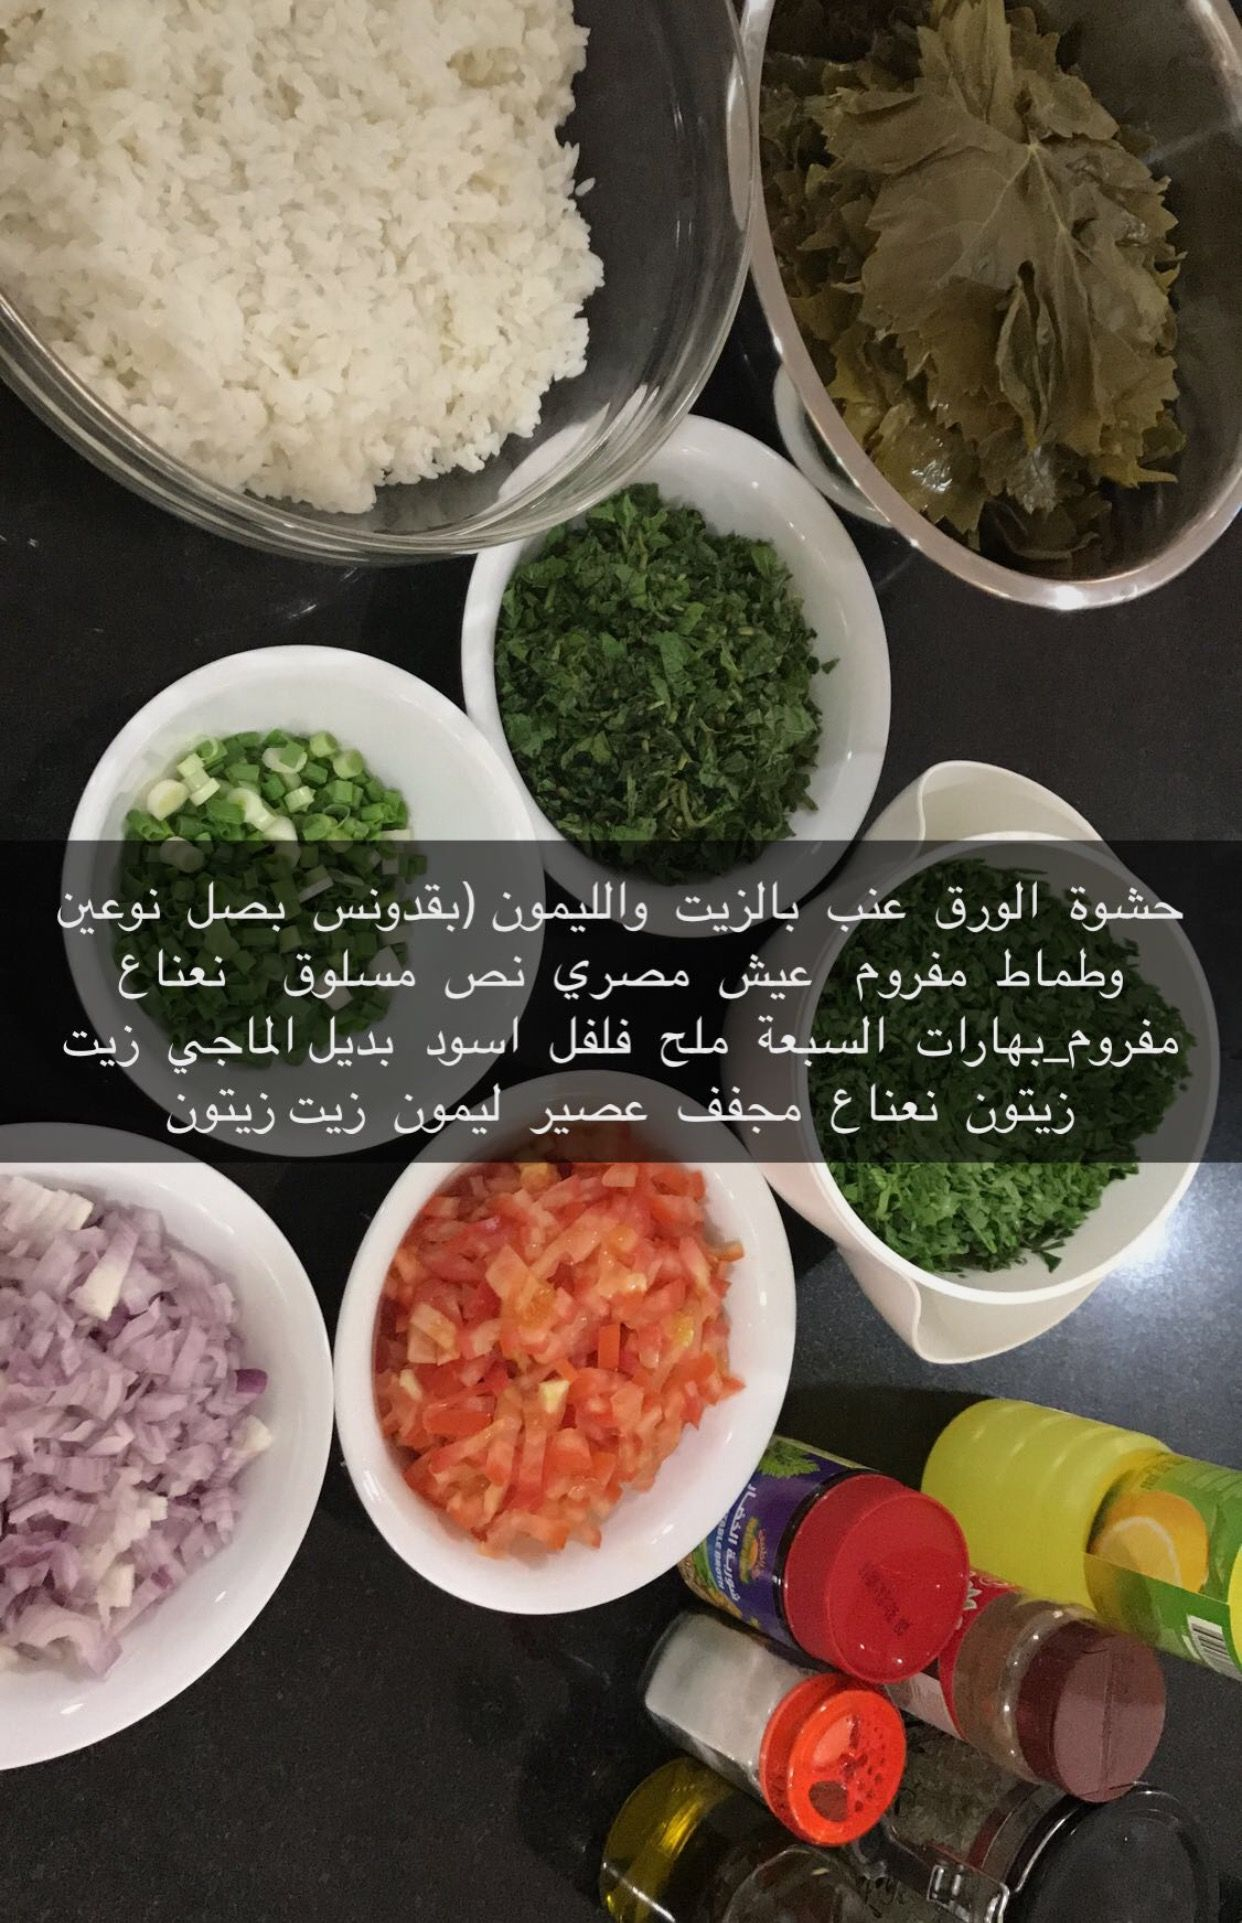 حشوة ورق العنب بالزيت والليمون Cooking Recipes Recipes Cooking